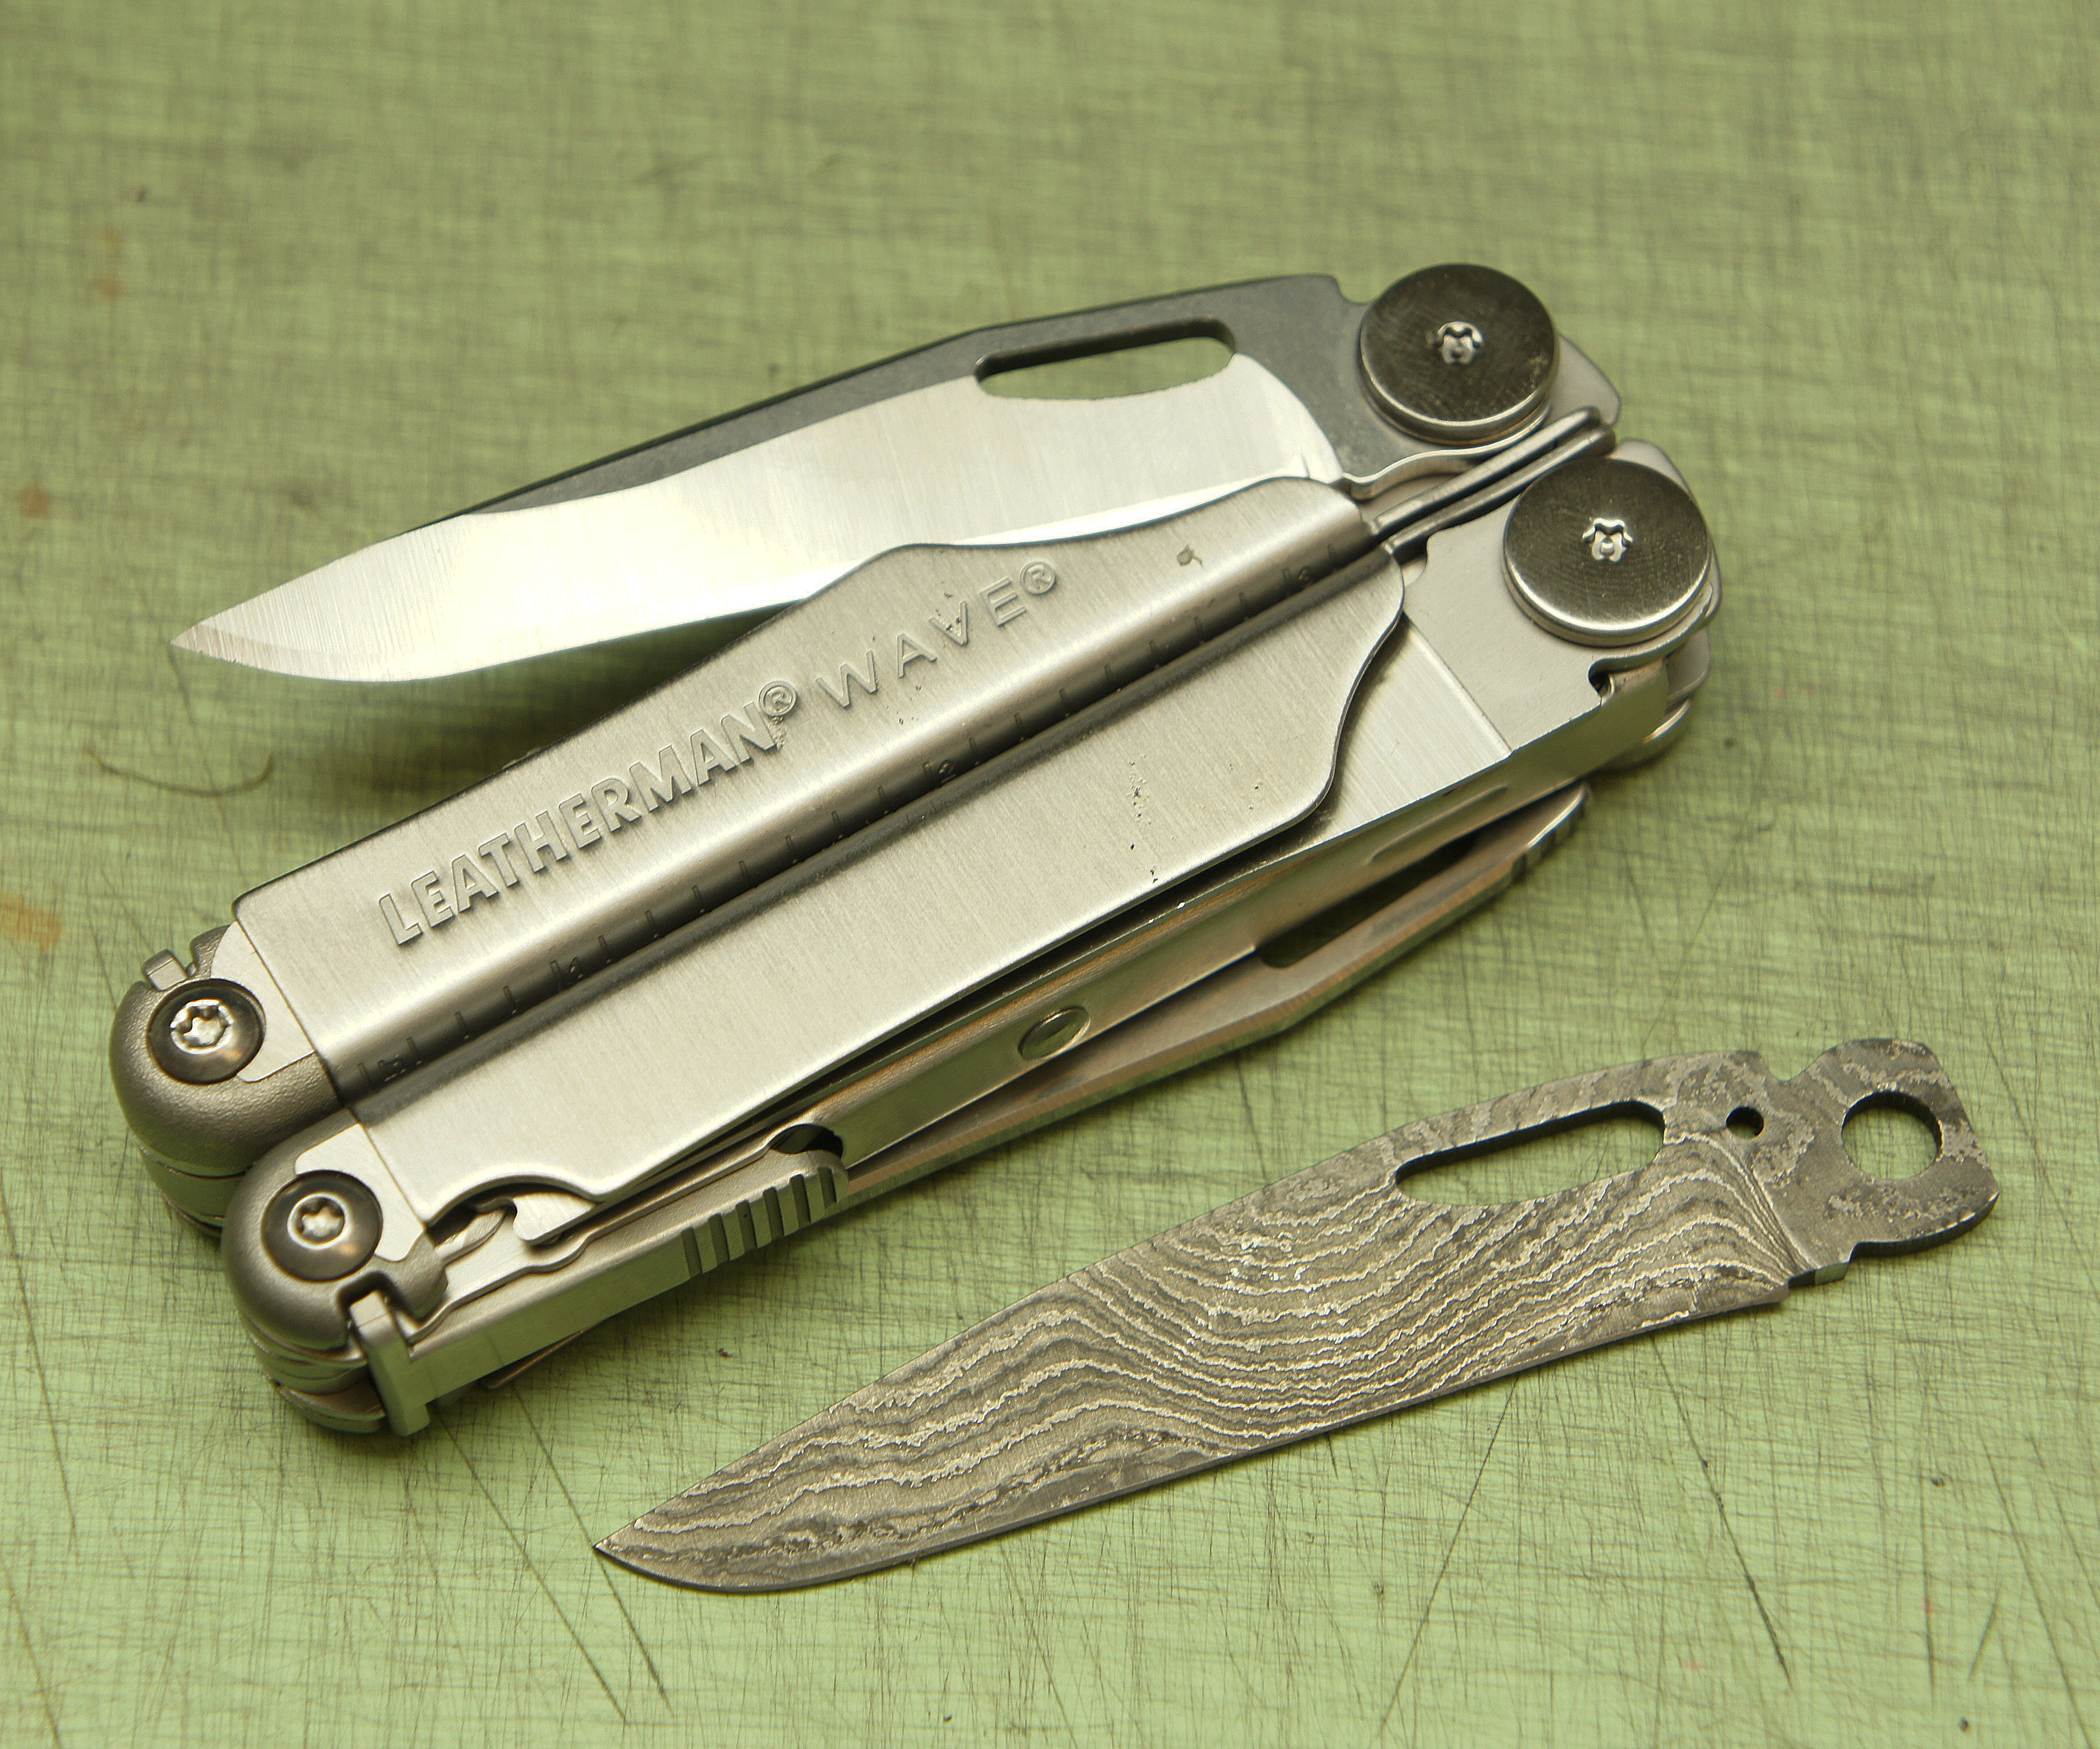 Scissors New Leatherman Parts Mod Replacement Wingman